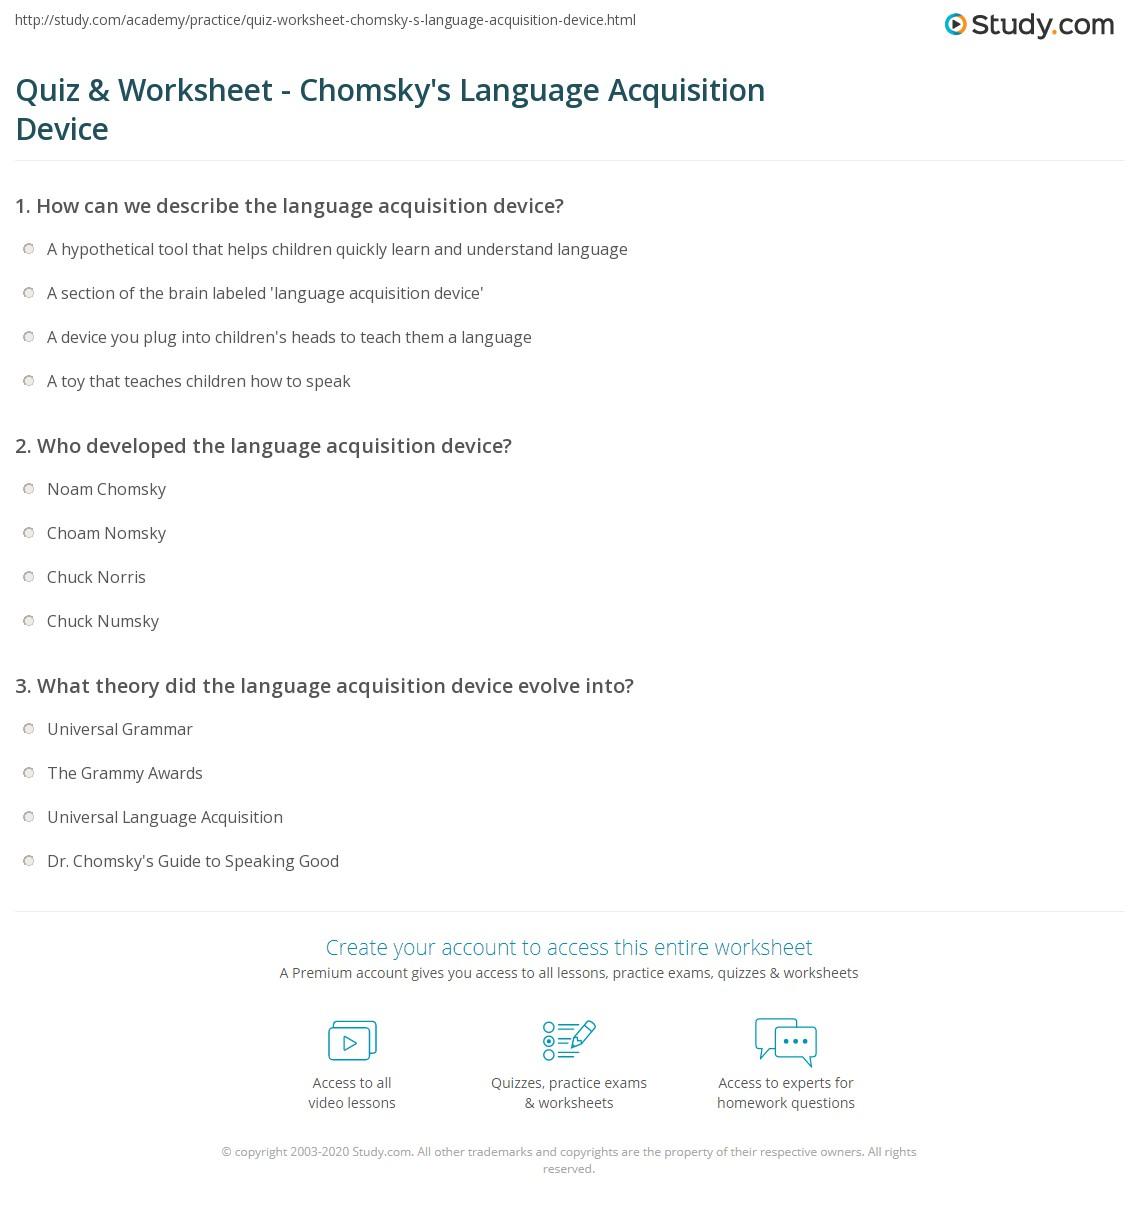 Quiz & Worksheet - Chomsky's Language Acquisition Device | Study.com